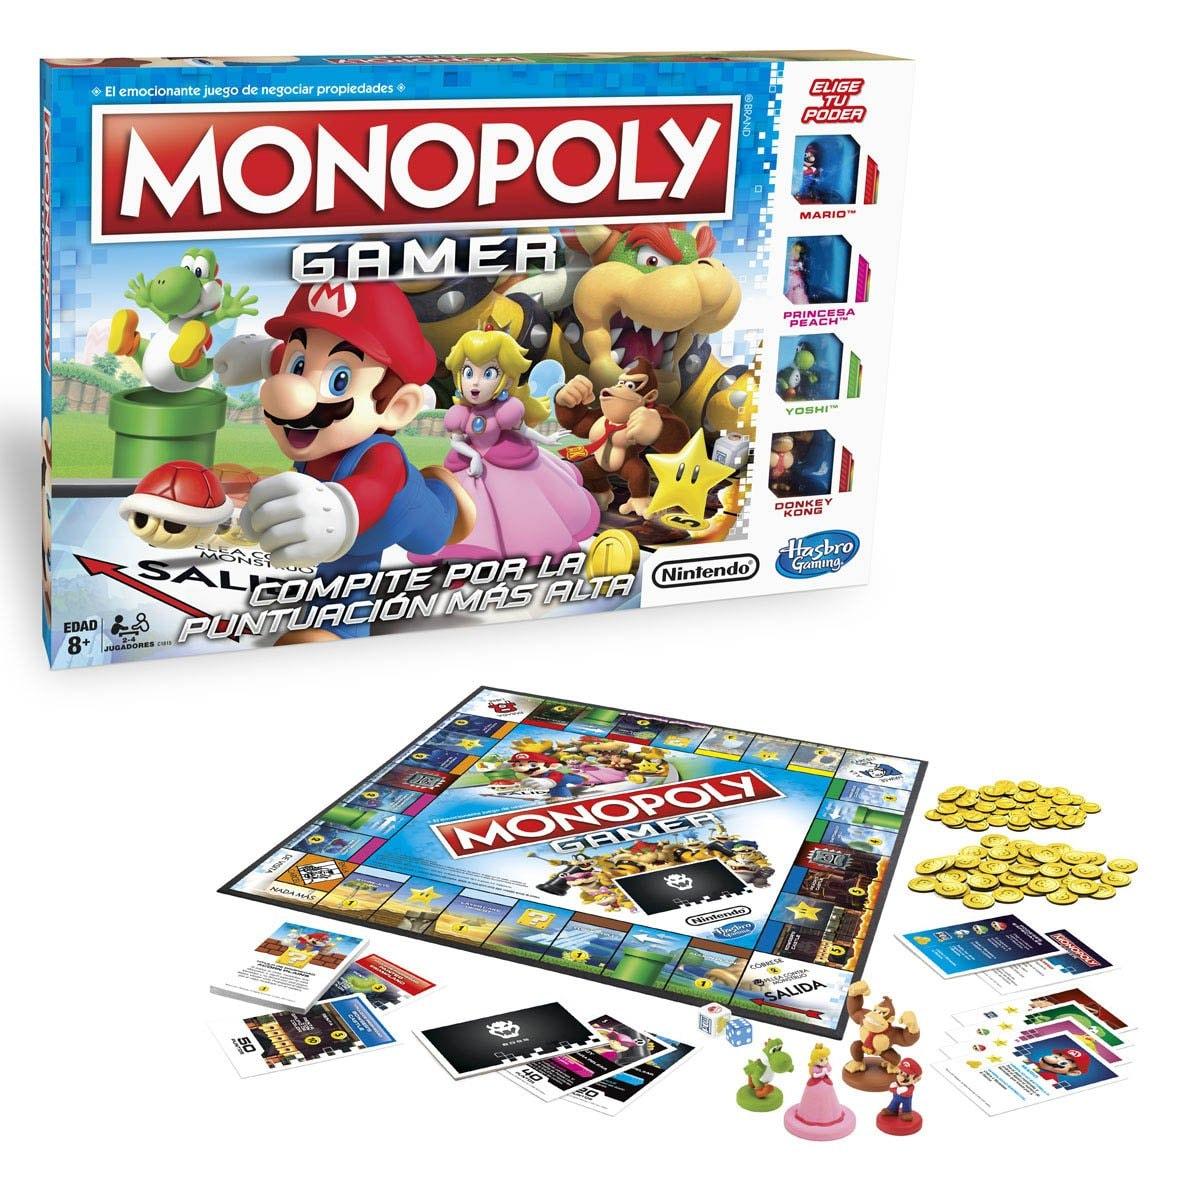 Monopoly Clásico Nintendo Hasbro